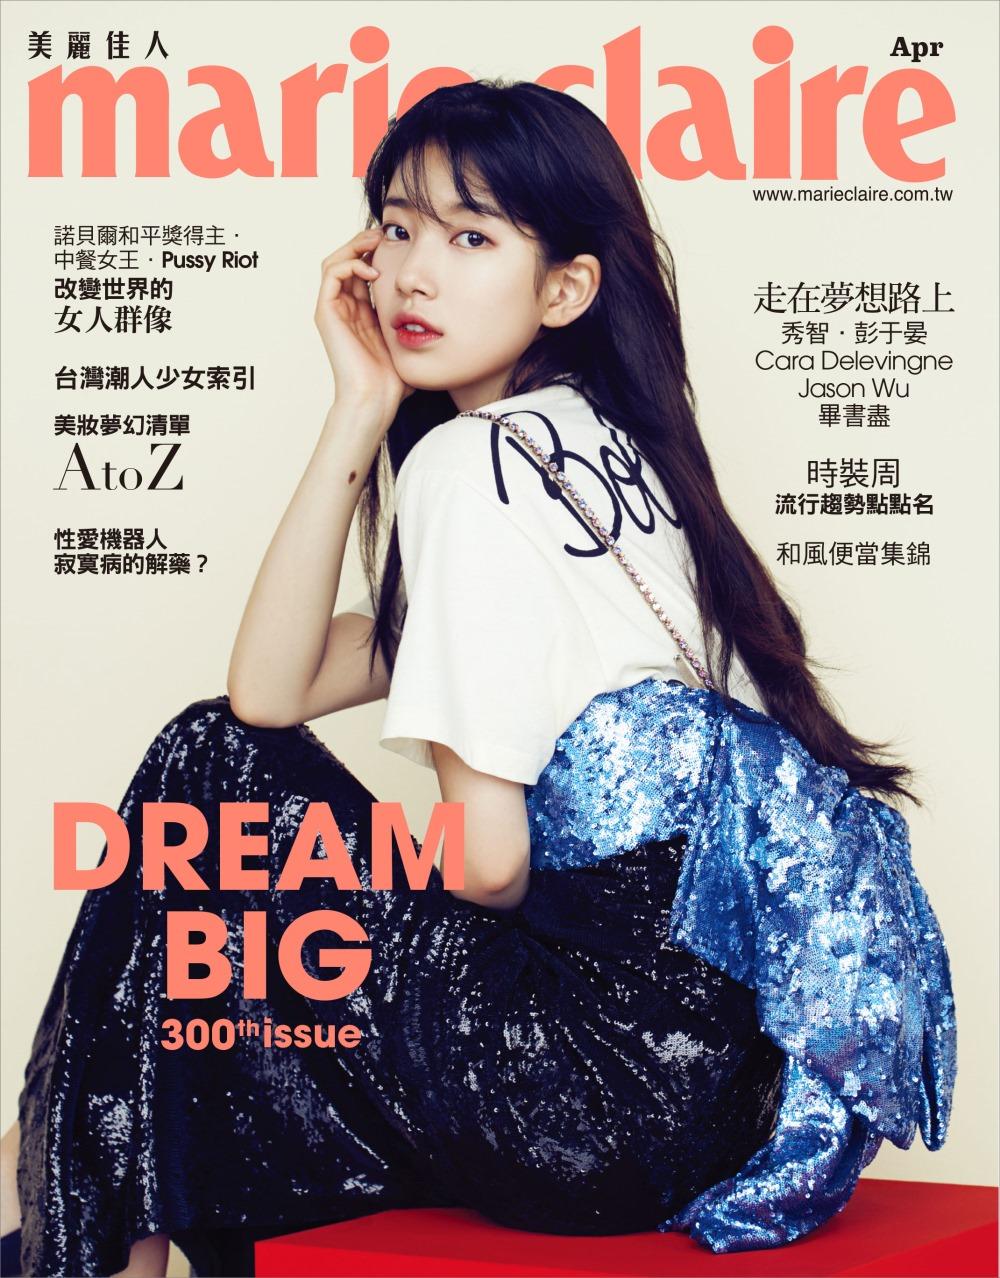 Marie Claire美麗佳人 4月號/2018 第300期 時尚版